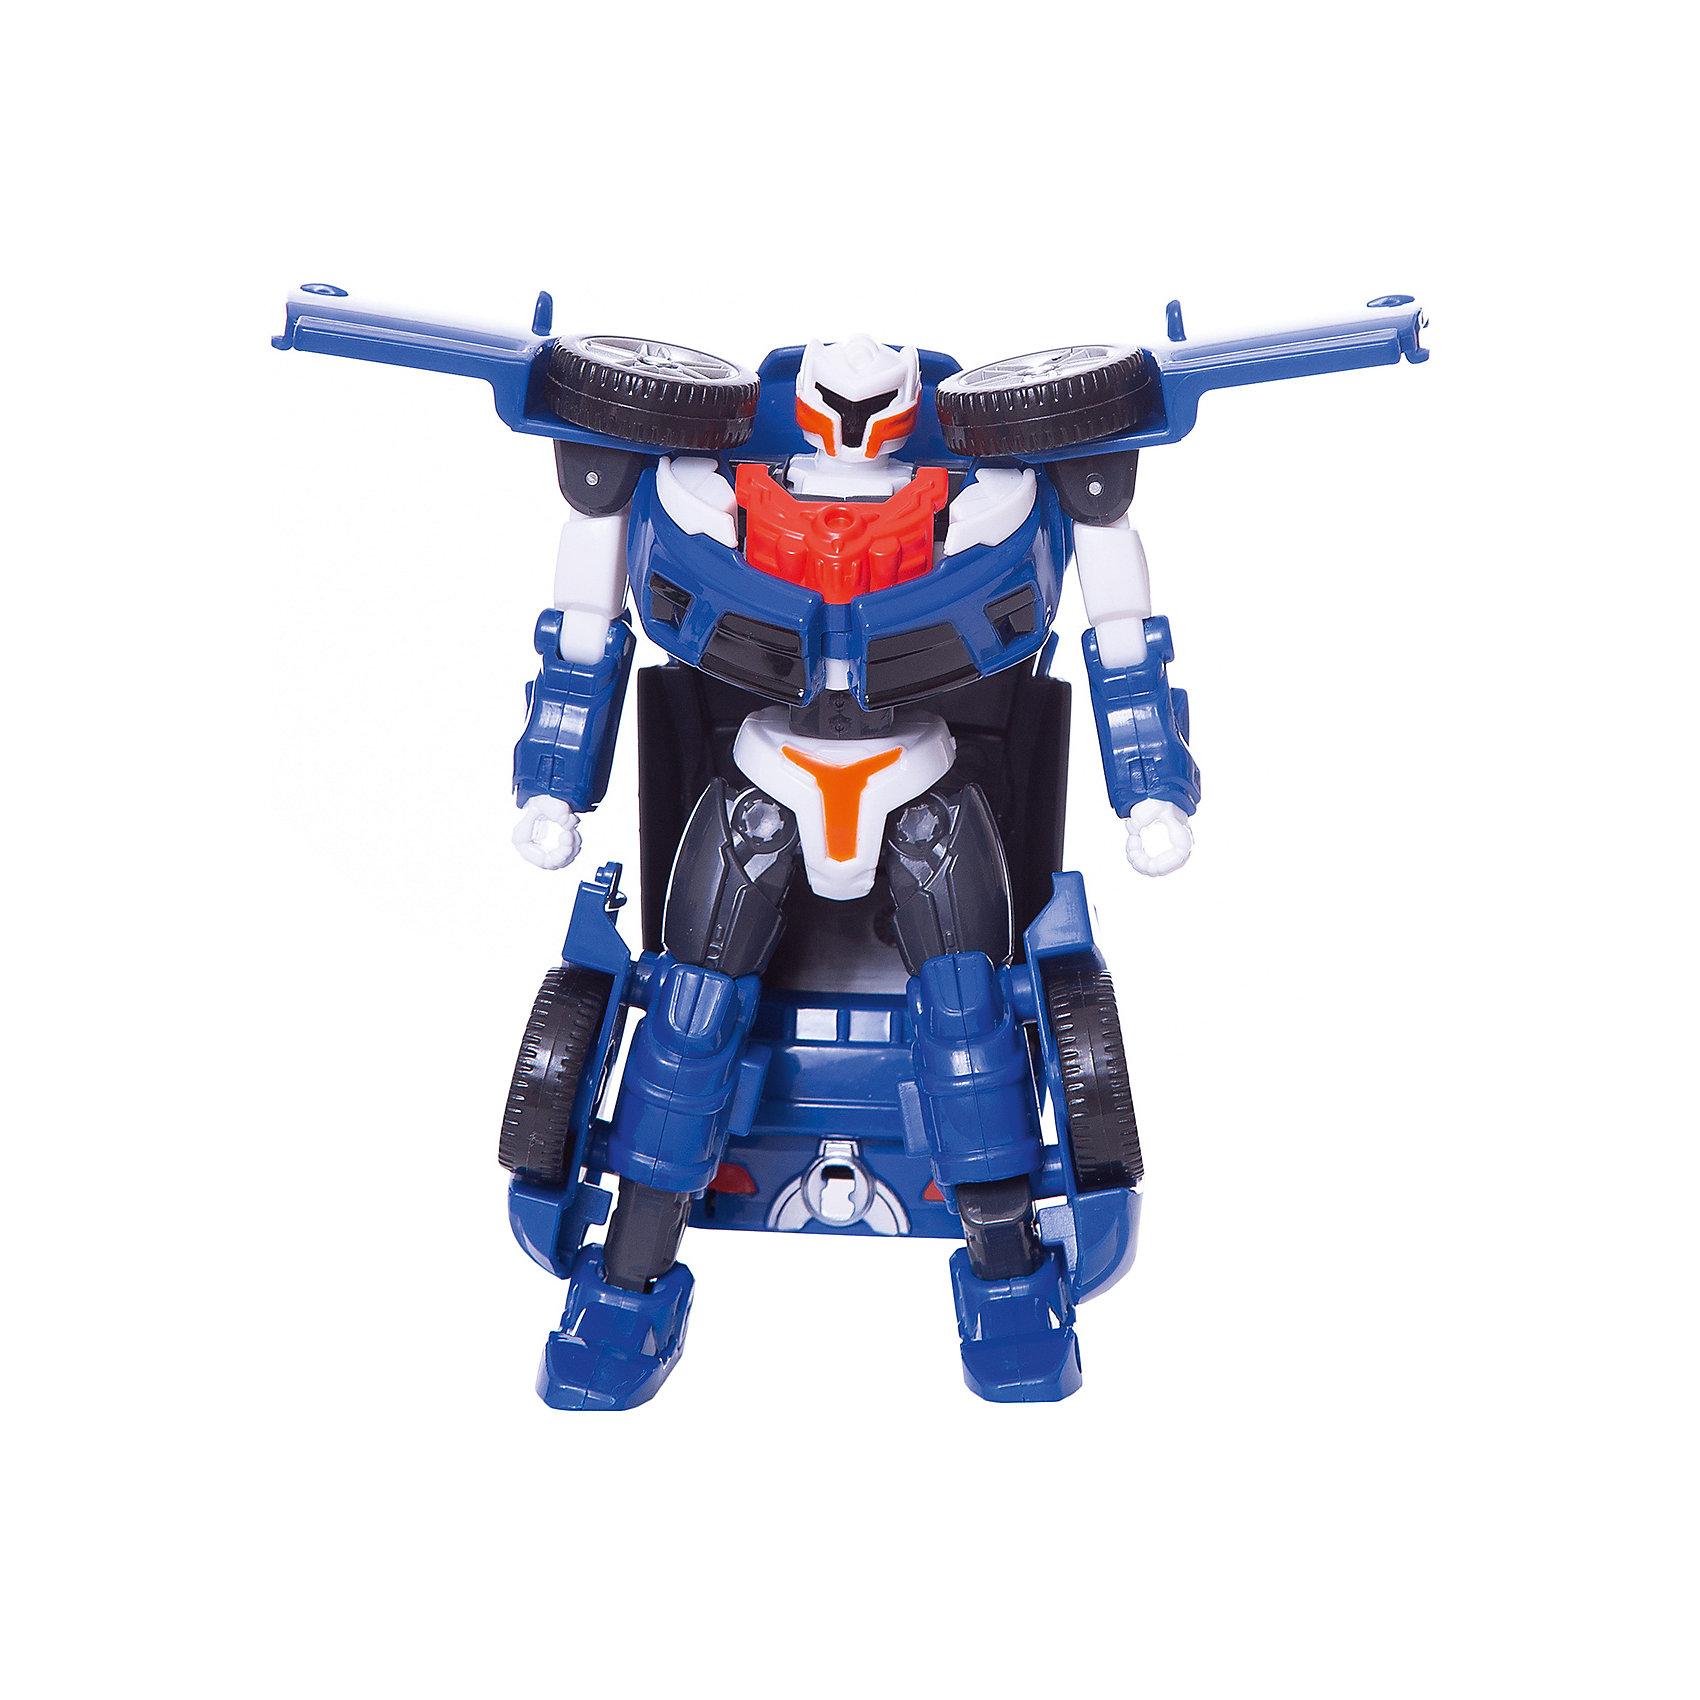 Yuong toys Трансформер Тобот Y yuong toys трансформер мини тобот y